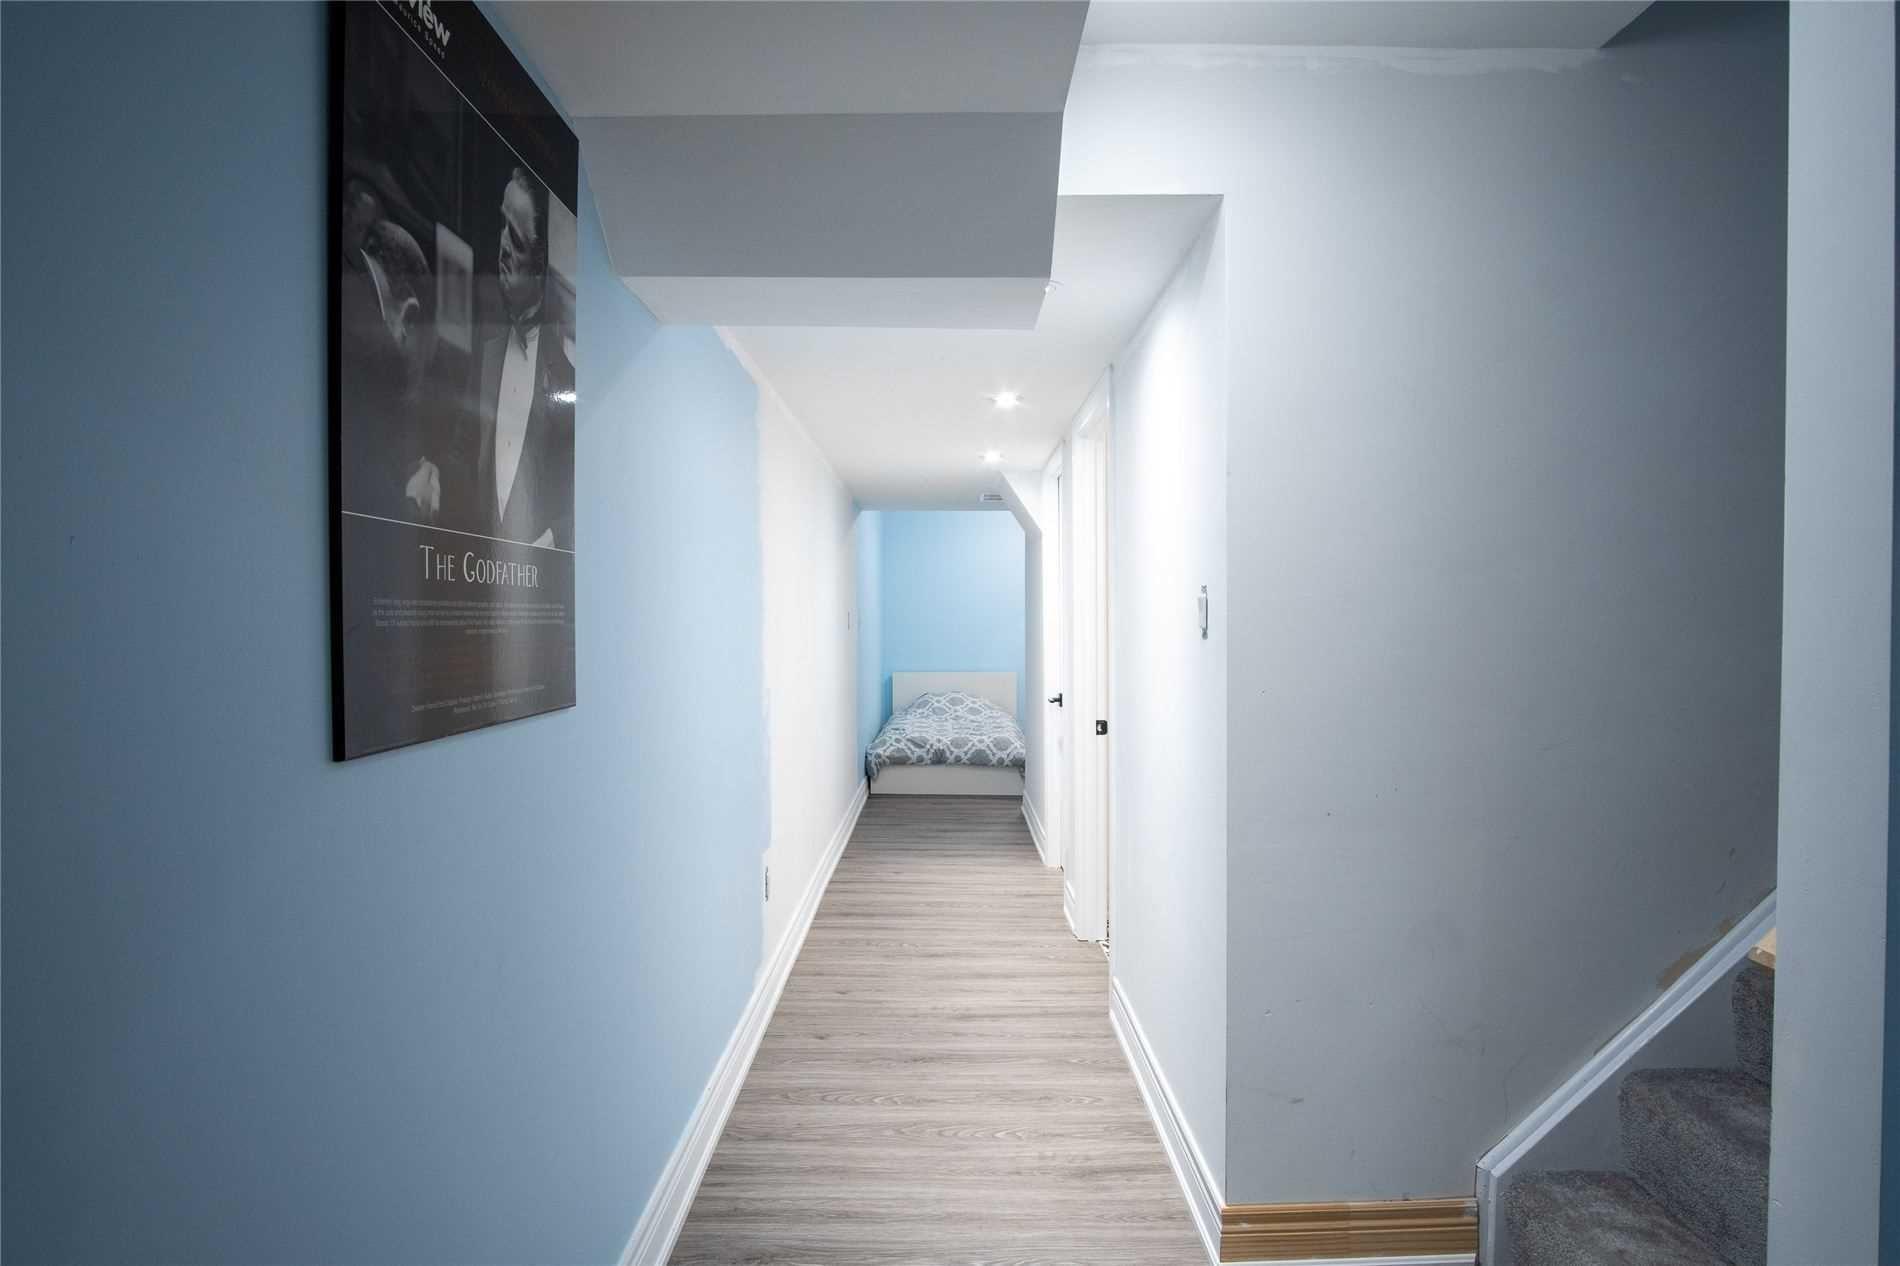 827 Biggar Hts - Coates Detached for sale, 4 Bedrooms (W5400280) - #25